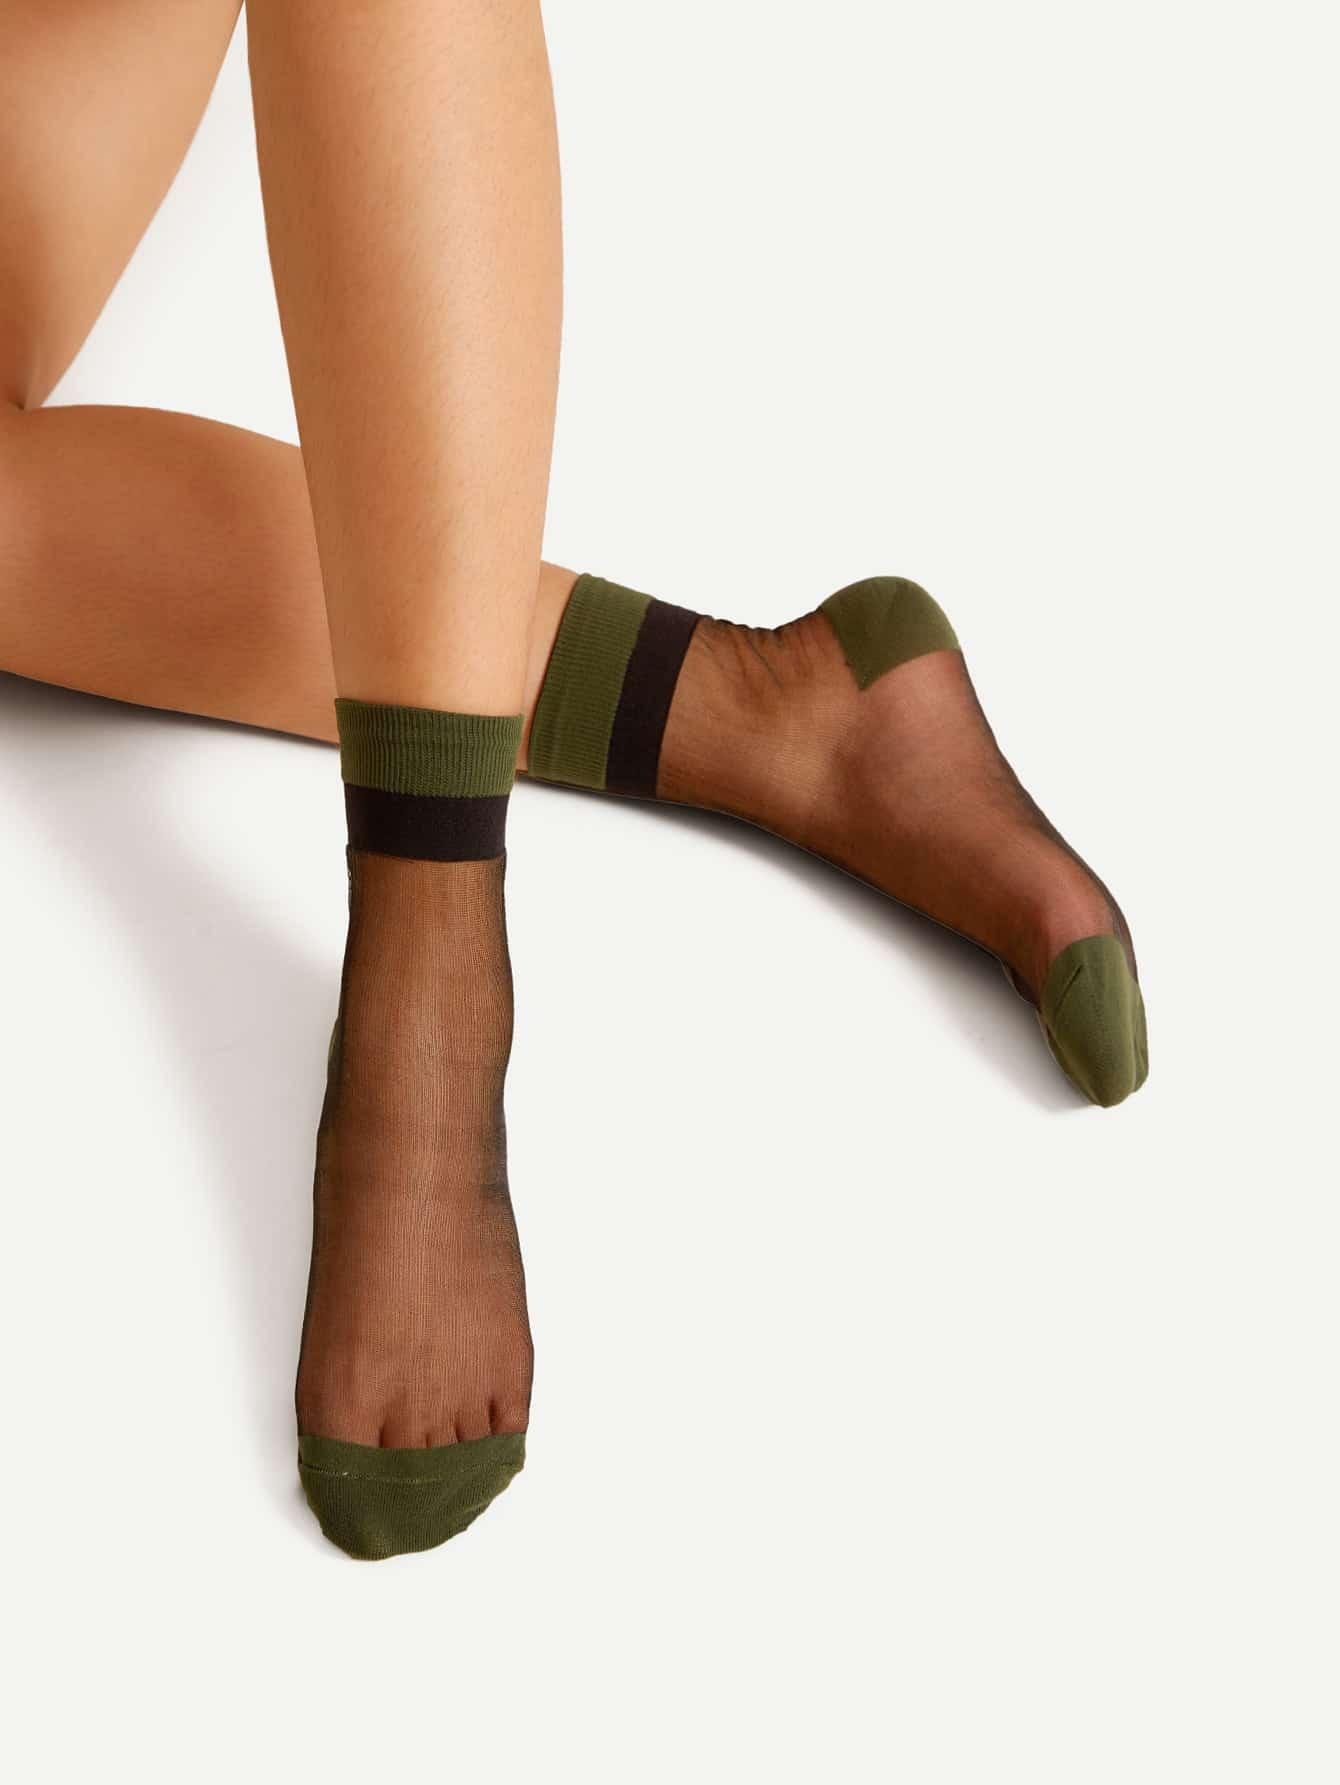 Contrast Heel And Toe Mesh Socks